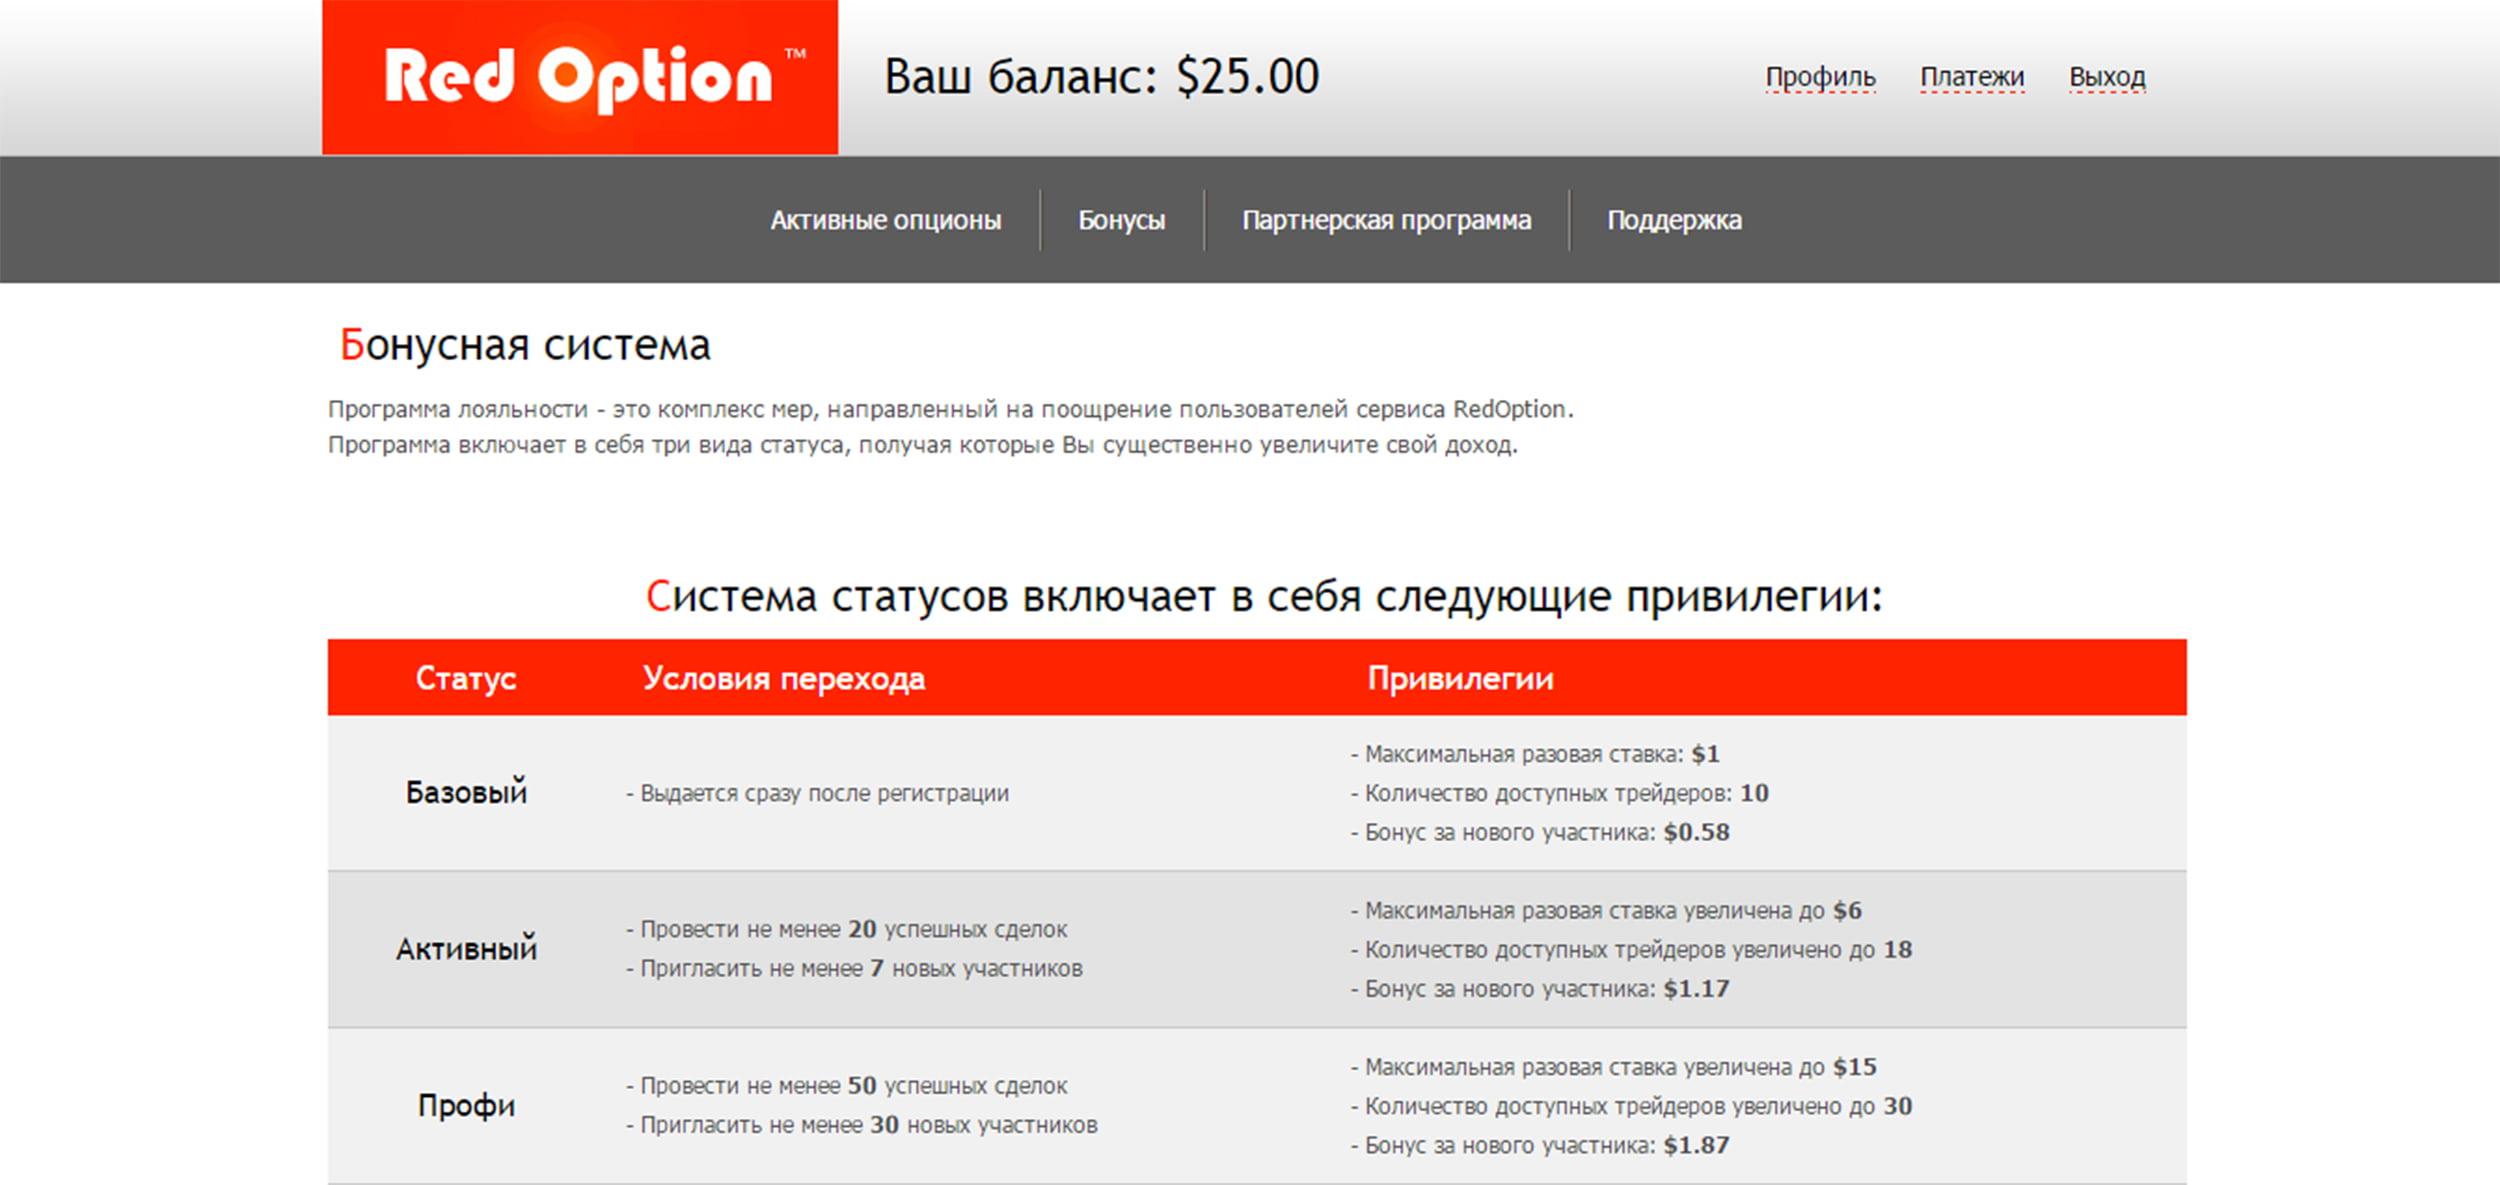 Регистрация на RedOption